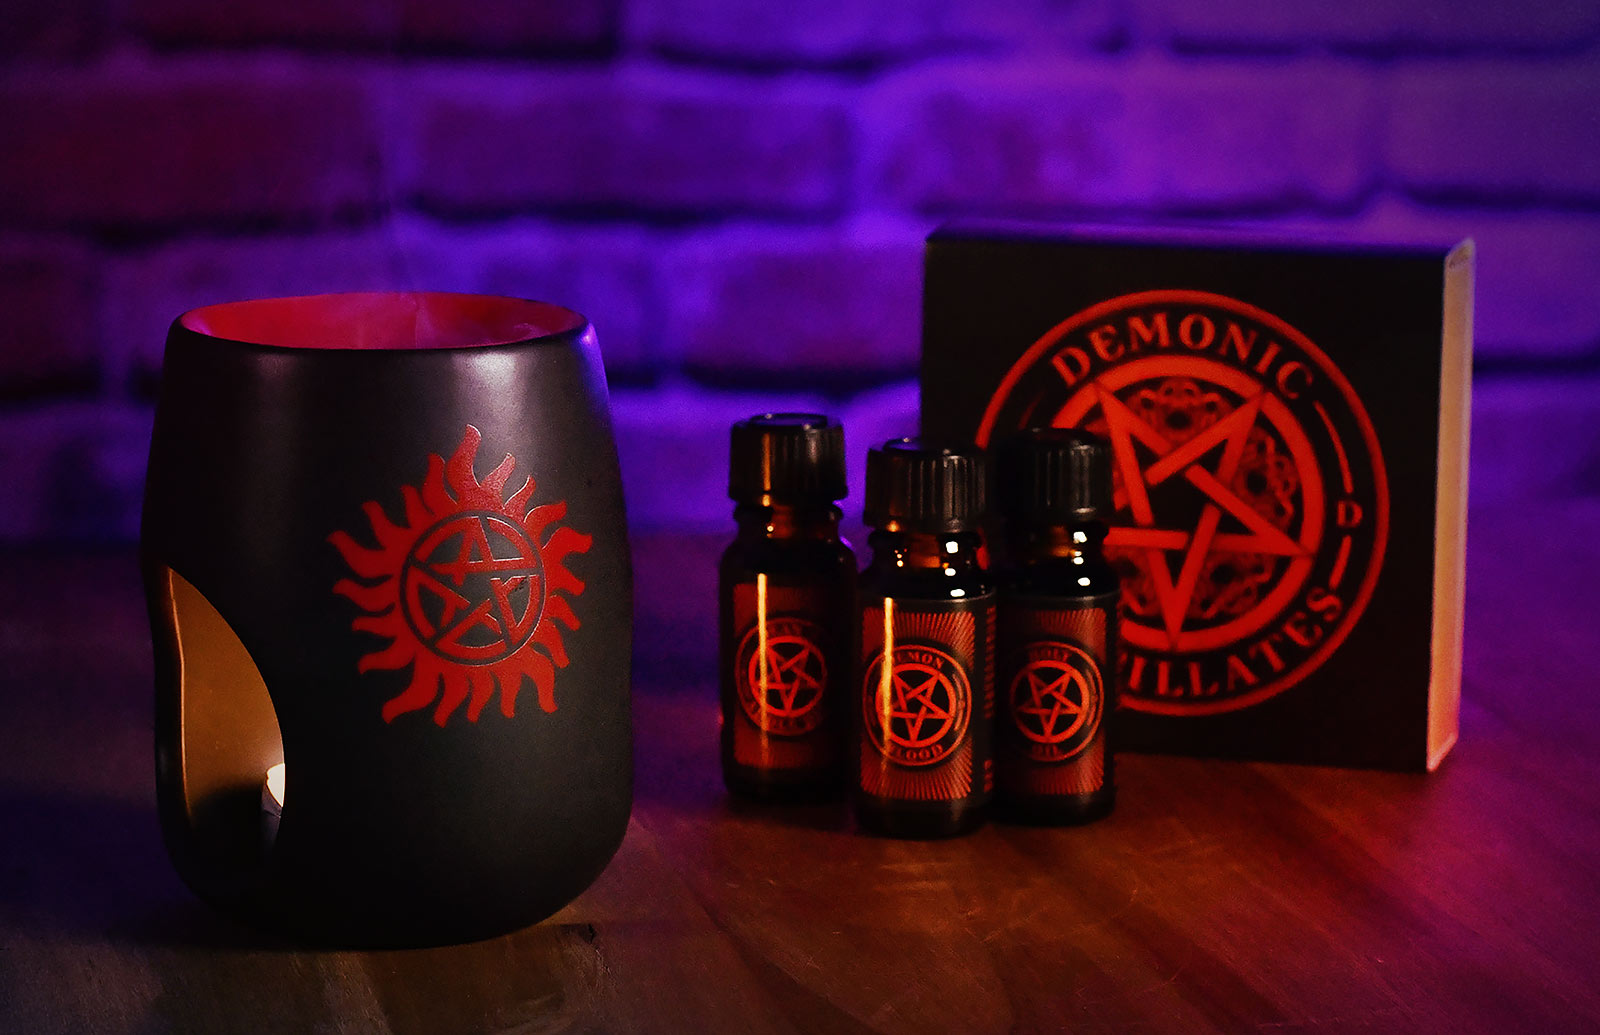 Supernatural - Anti Possession Symbol Duftlampe mit Duftöl